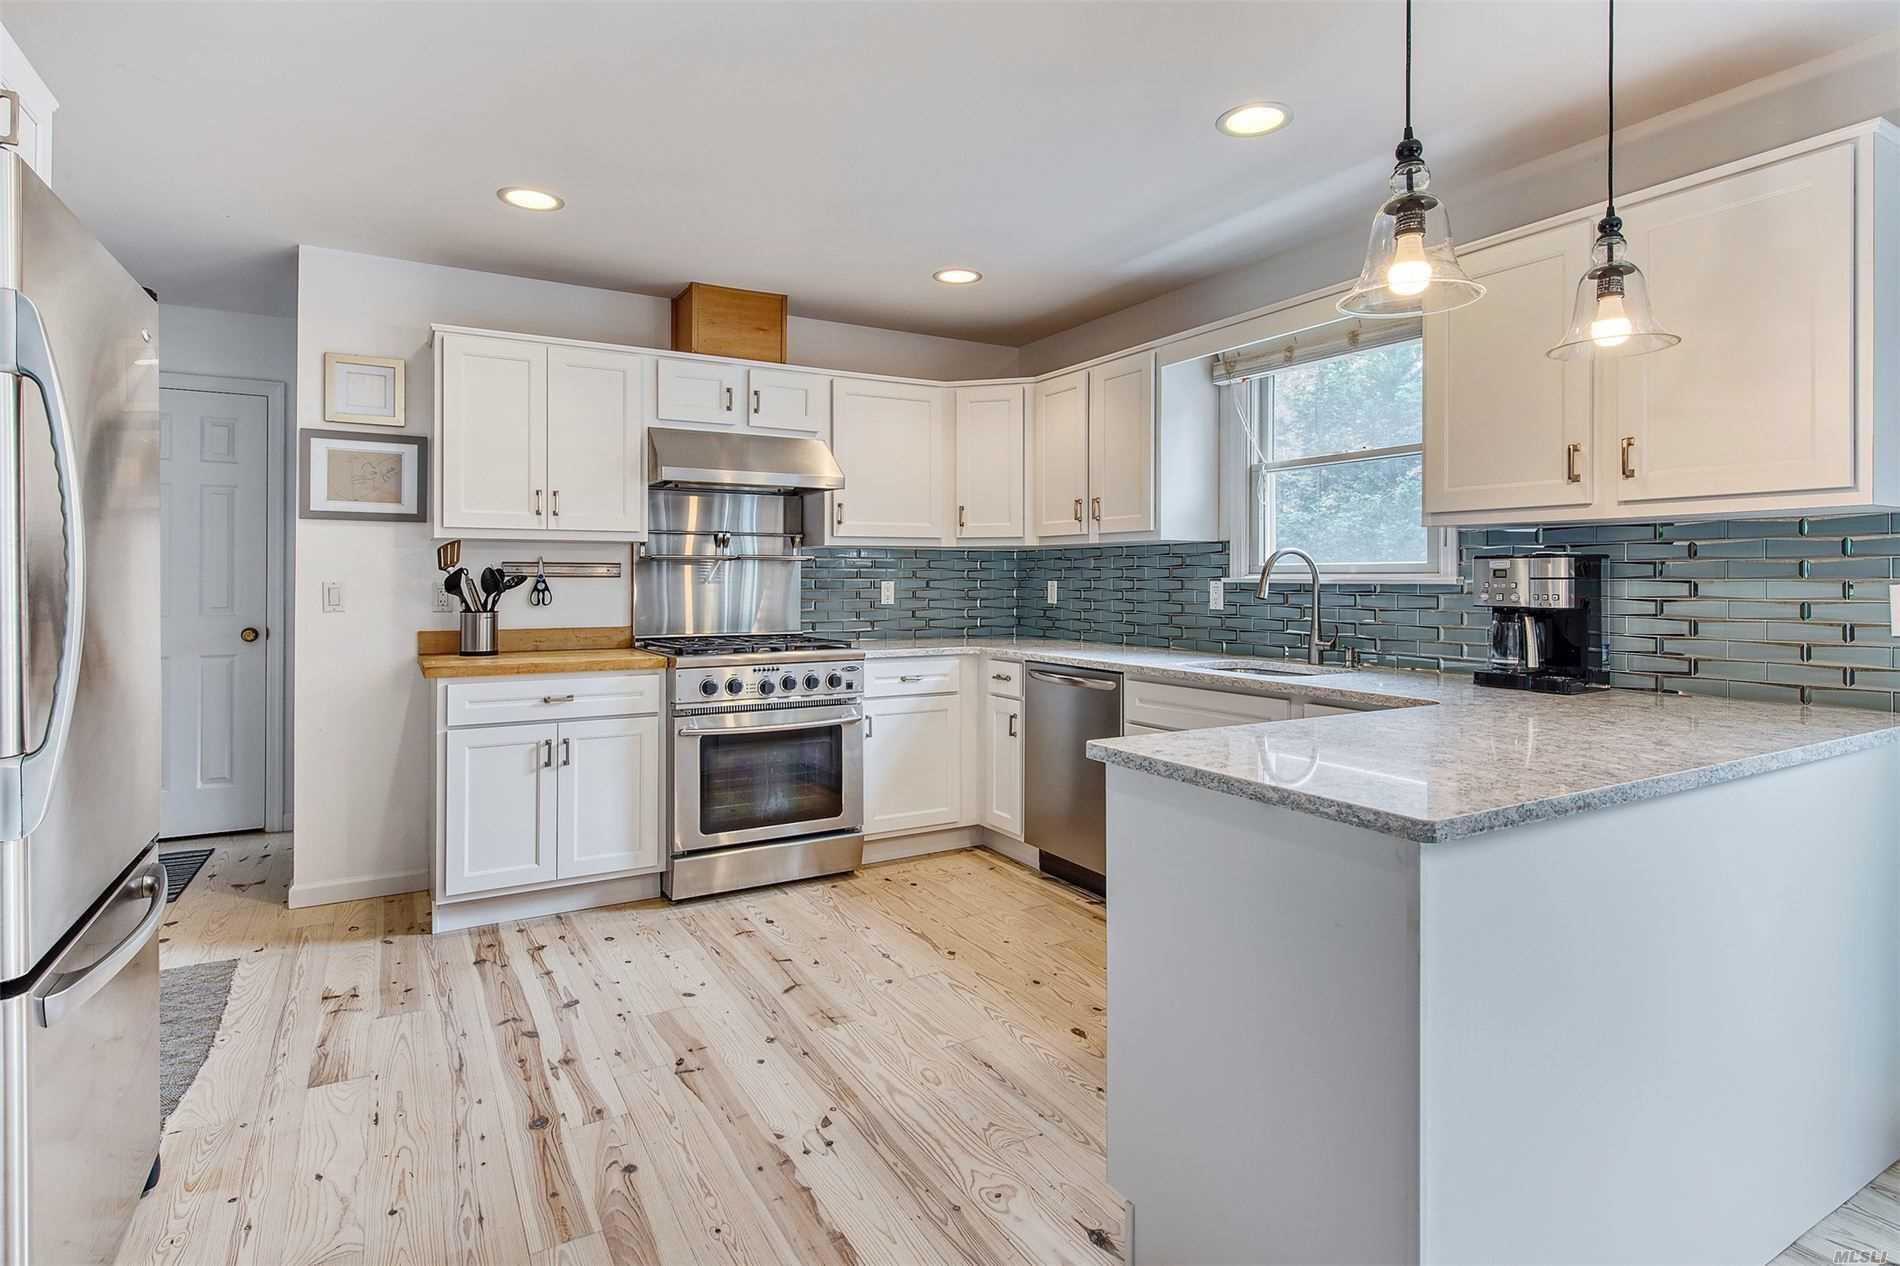 210 Soundview Ave Peconic, NY 11958